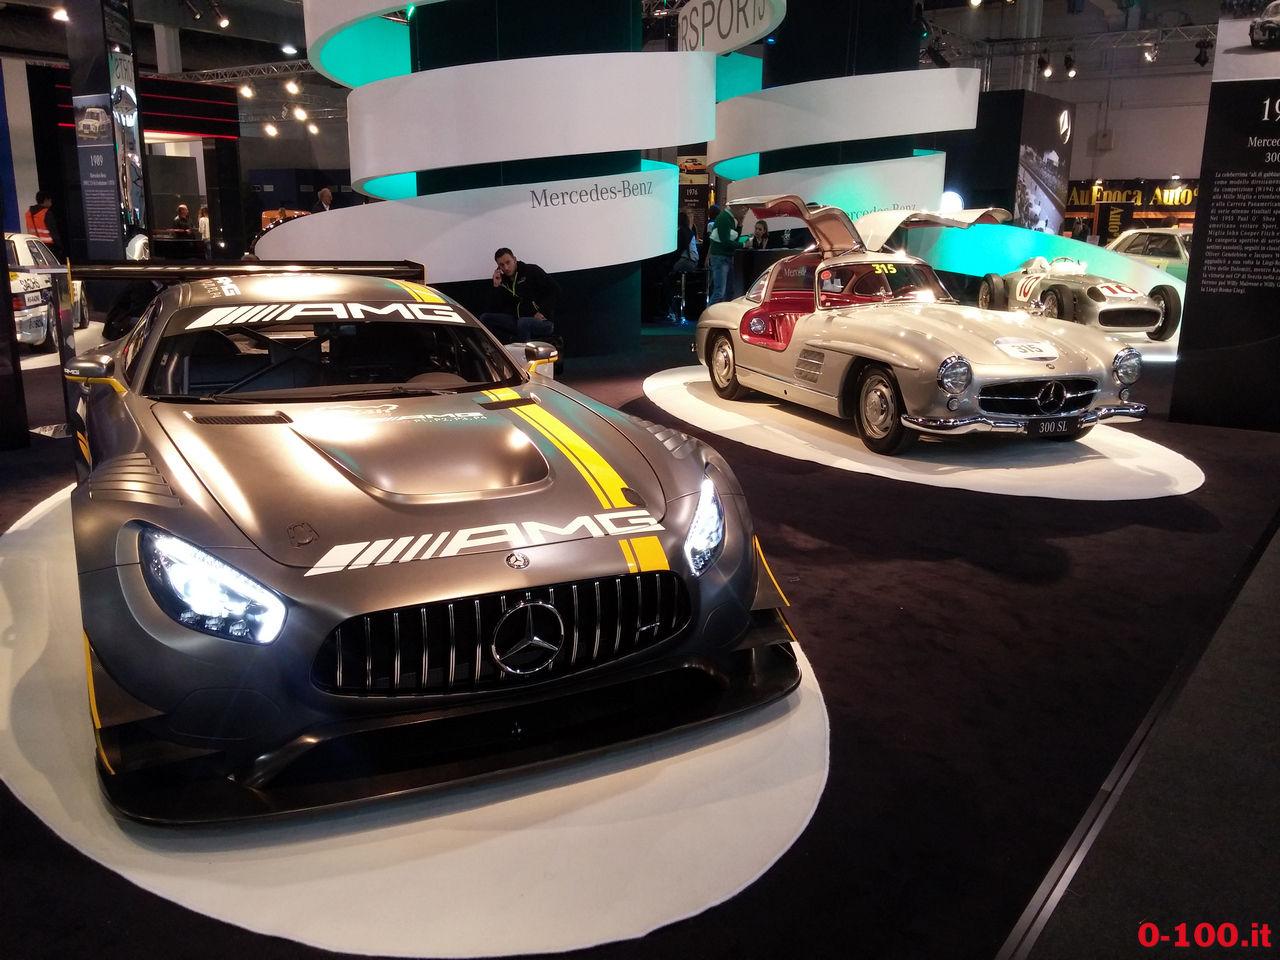 automotodepoca-2016-mercedes-car-market-mercato-auto-prezzo-price_0-10023